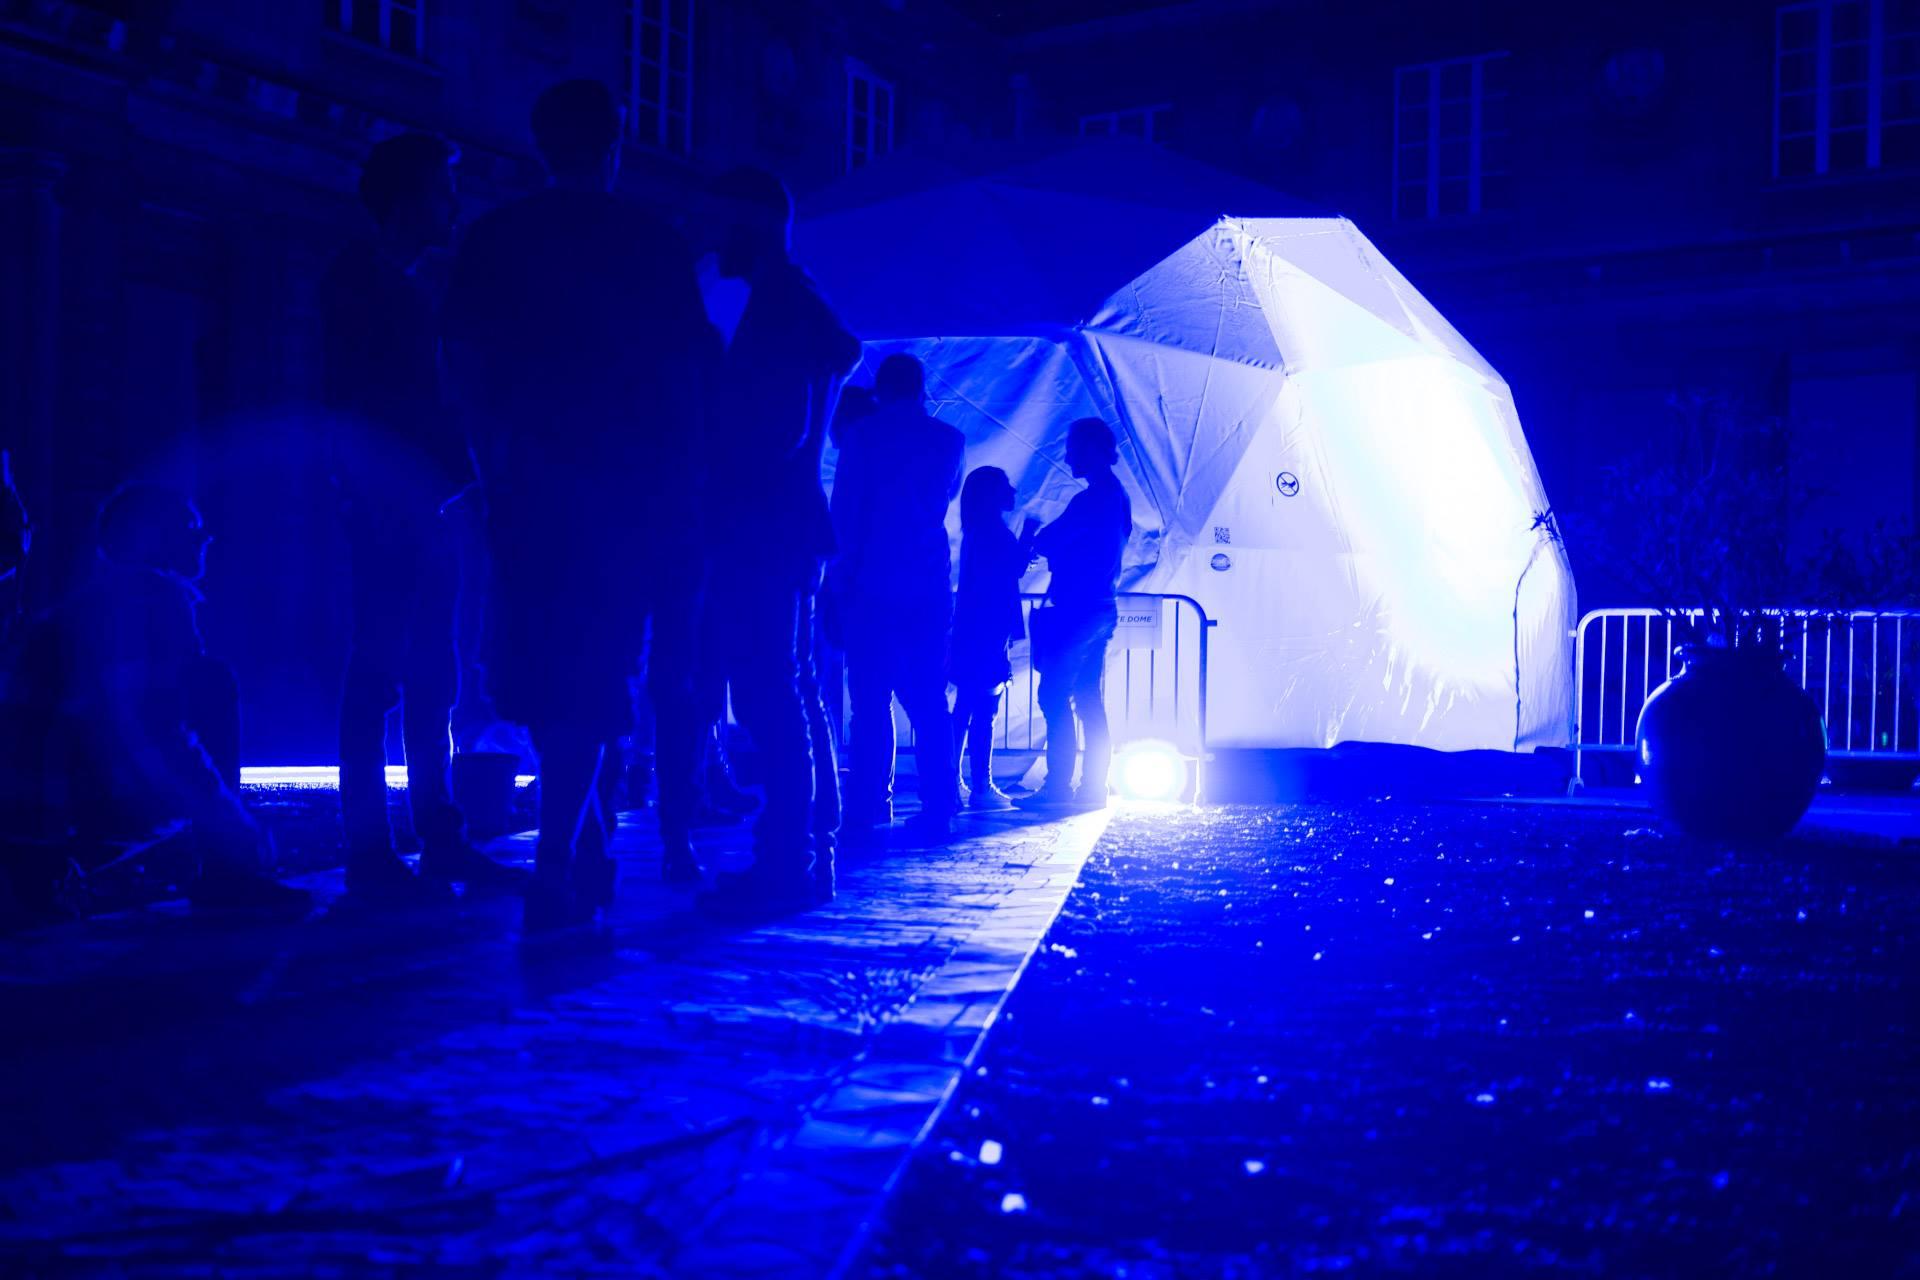 eav5 - festival creations originales preformance av masterclass video-mapping bordeaux (3)